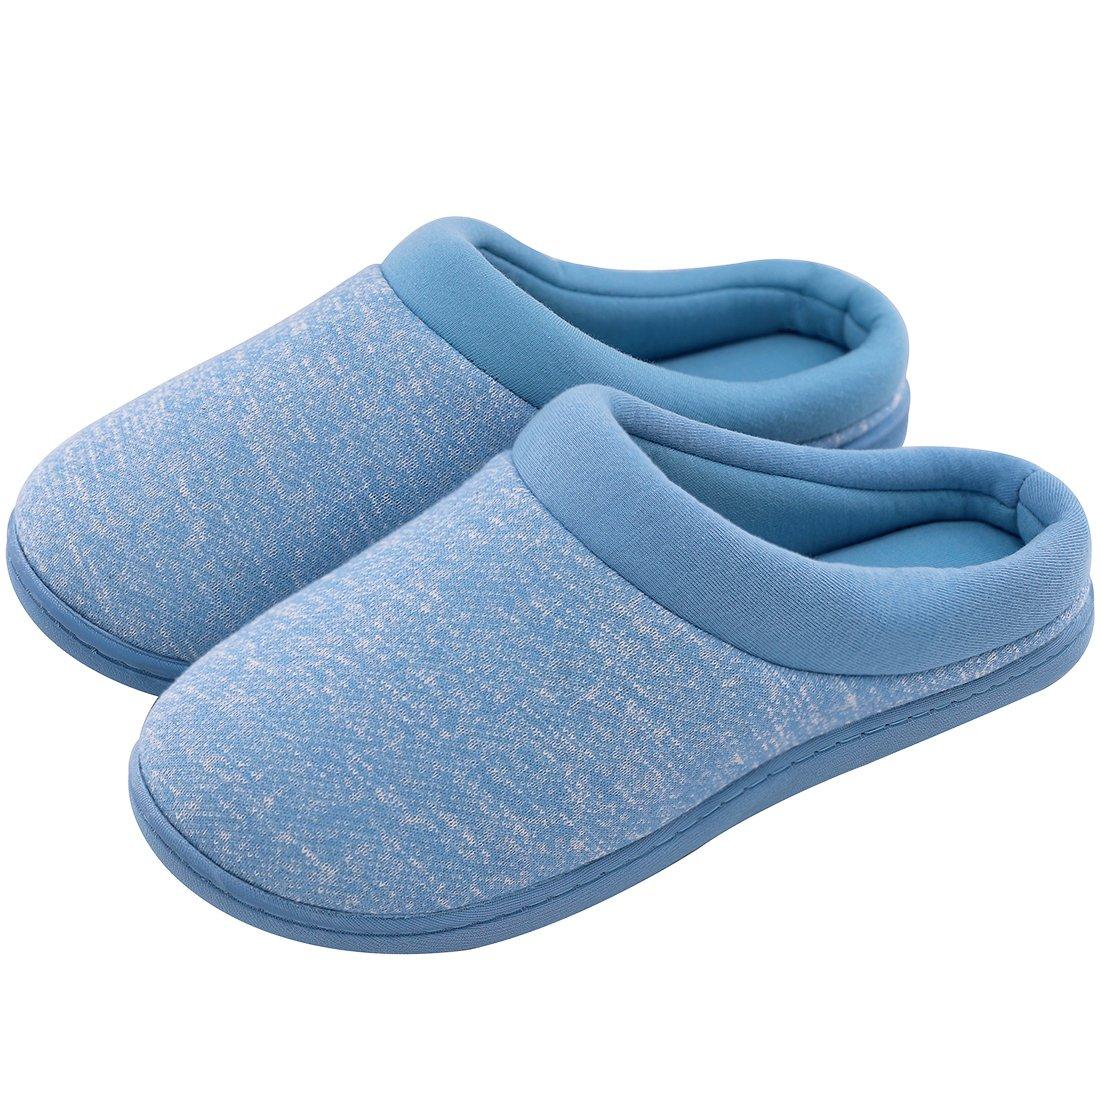 Women's Comfort Slip On Memory Foam French Terry Lining Indoor Clog House Slippers (Medium / 7-8 B(M) US, Blue)